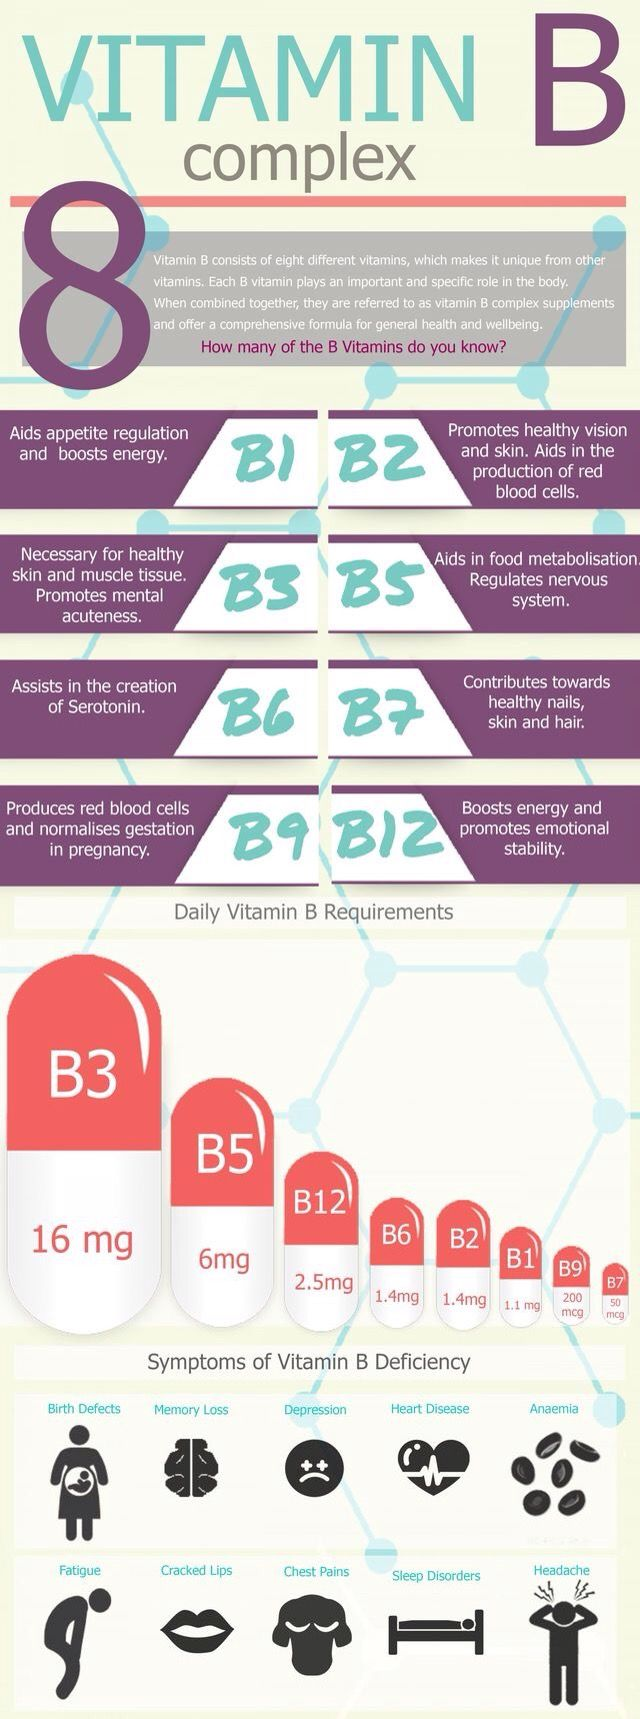 53 best B12 vitamin images on Pinterest   Vitamin b12 benefits ...